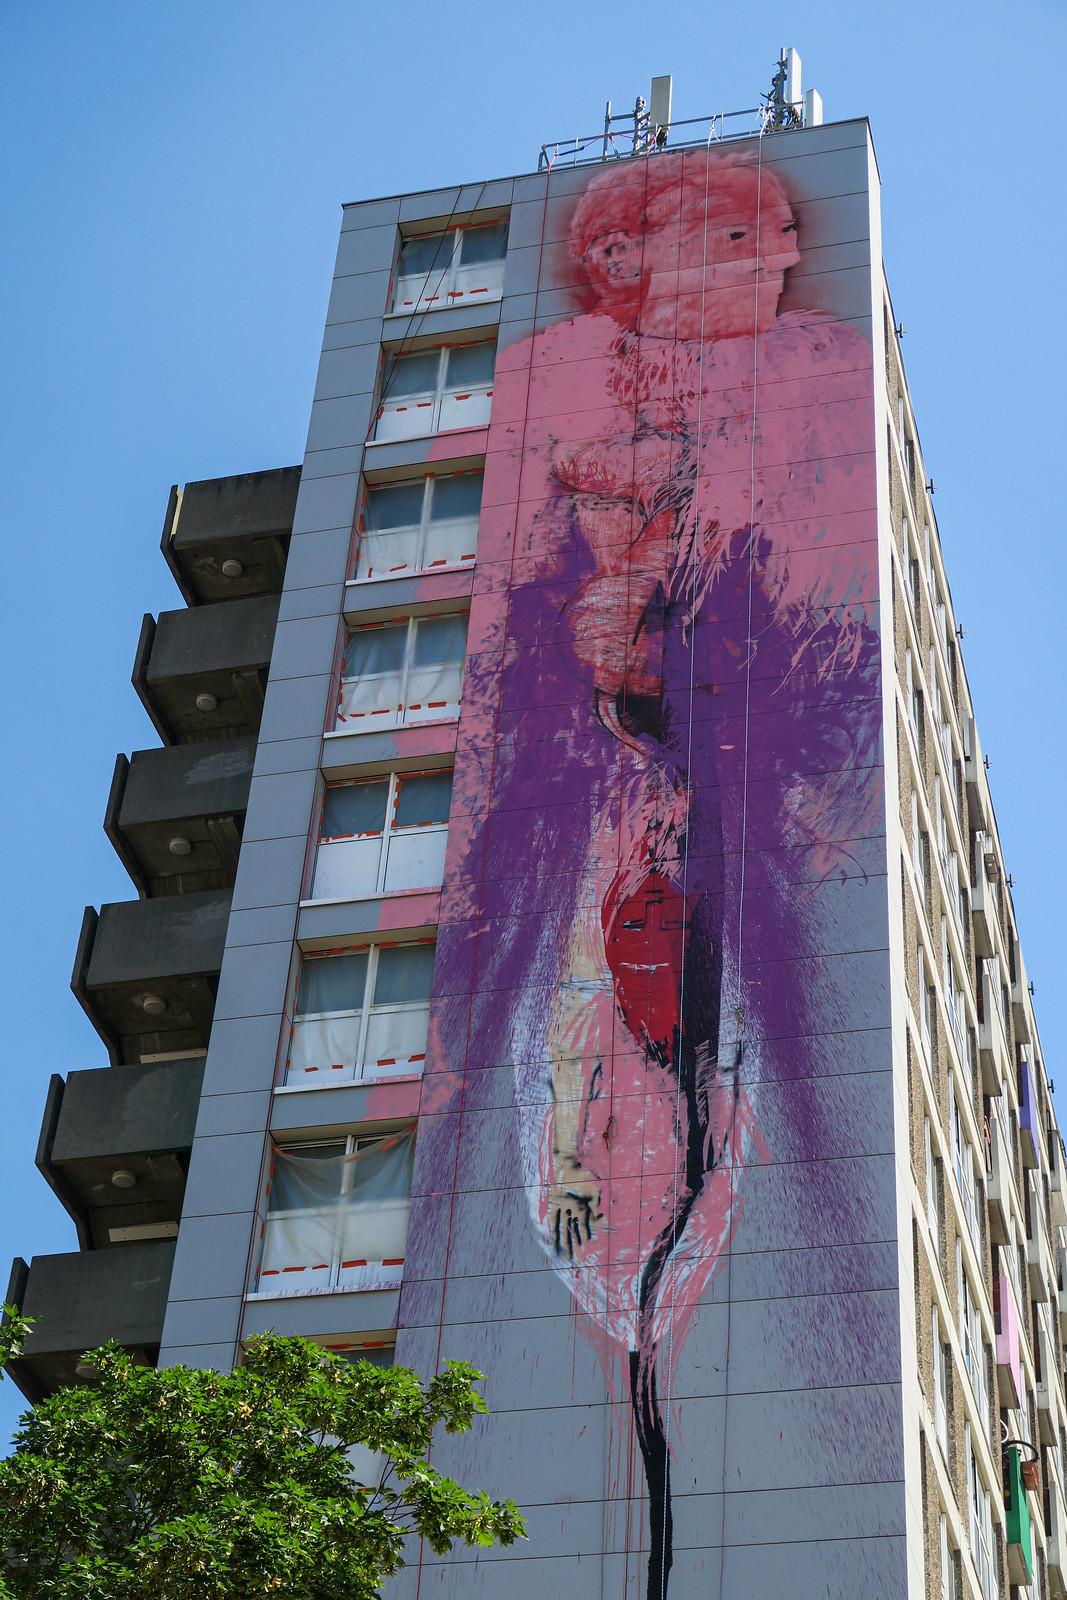 Tour des Brigittines mural by Bonom